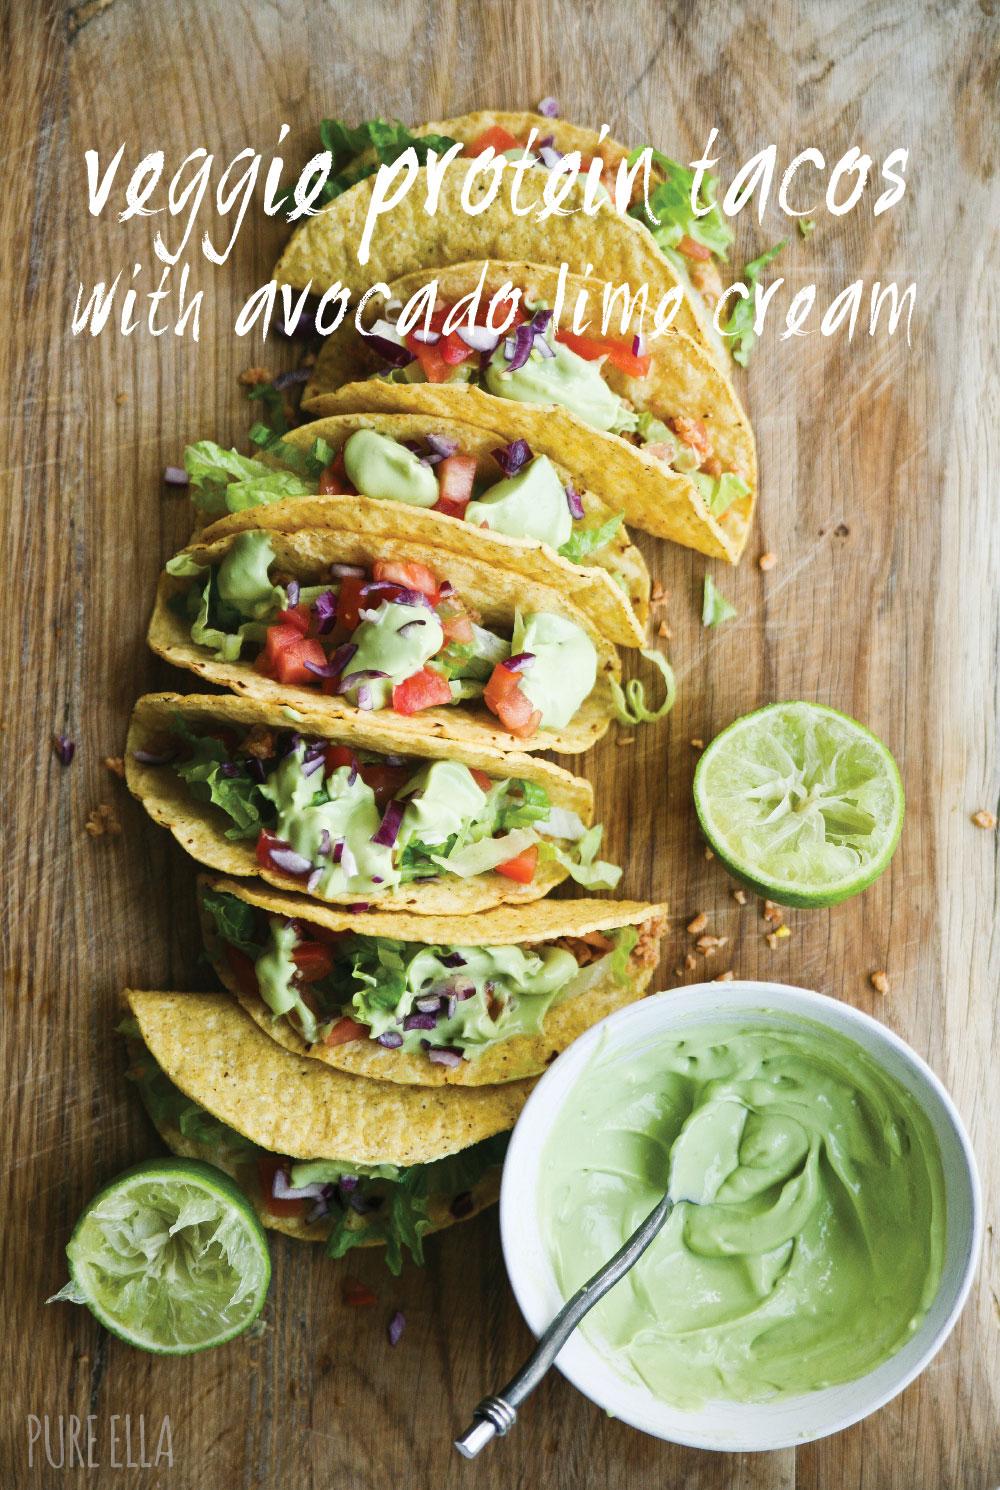 Veggie Protein Tacos with Avocado Lime Cream